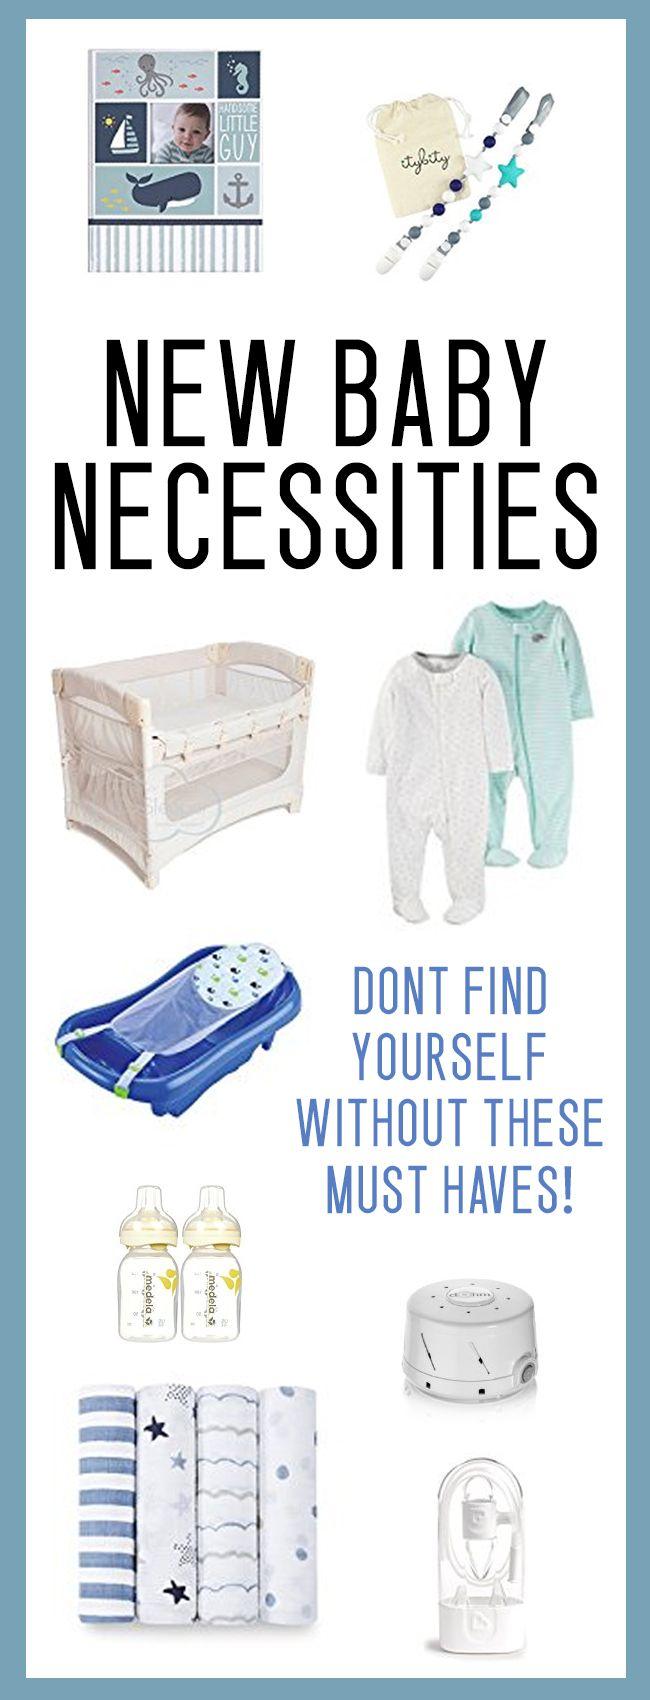 GREAT baby shower gift ideas / new baby necessities list!